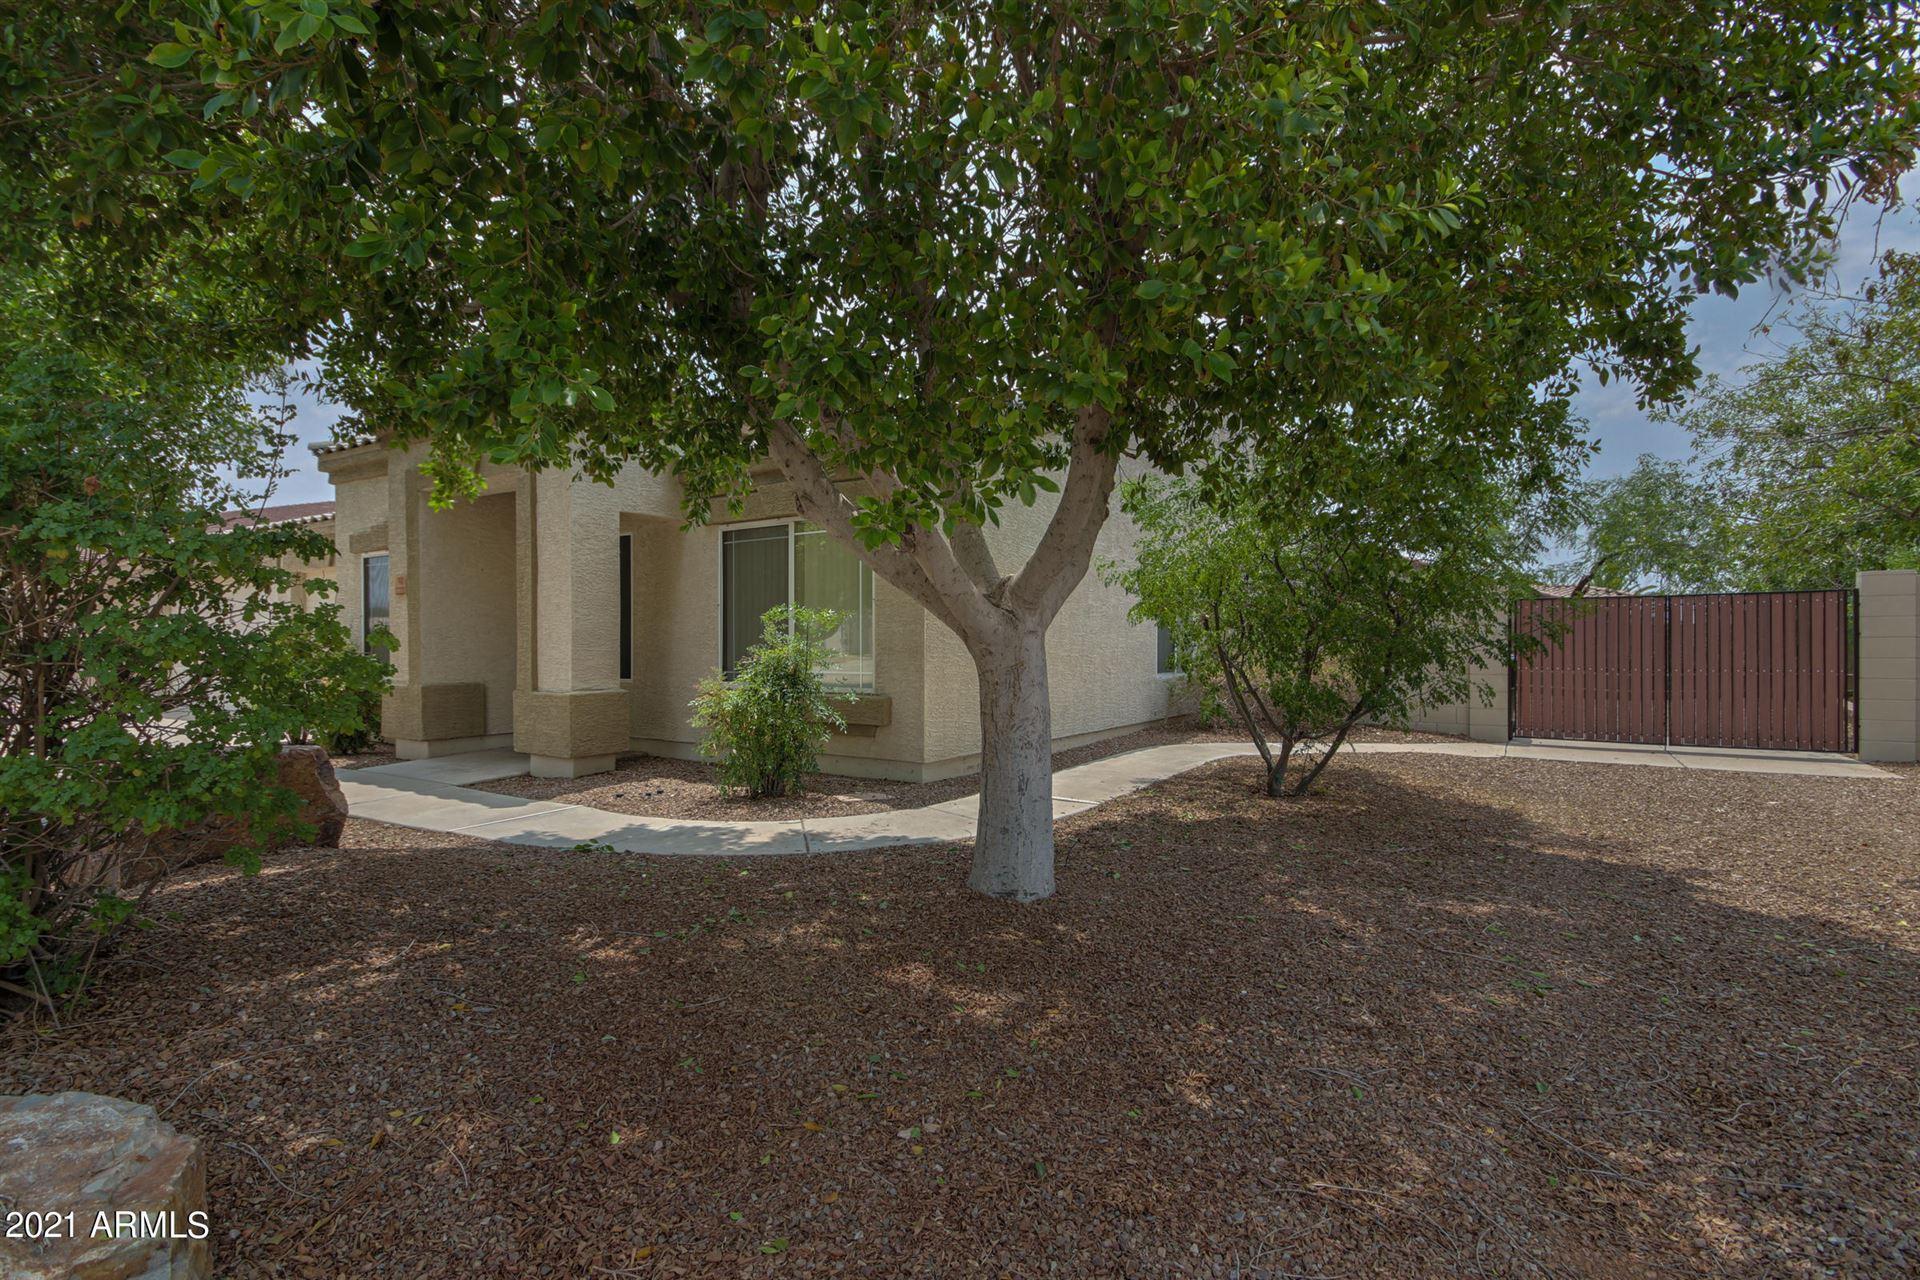 Photo of 902 S Stilton Circle, Mesa, AZ 85208 (MLS # 6269295)